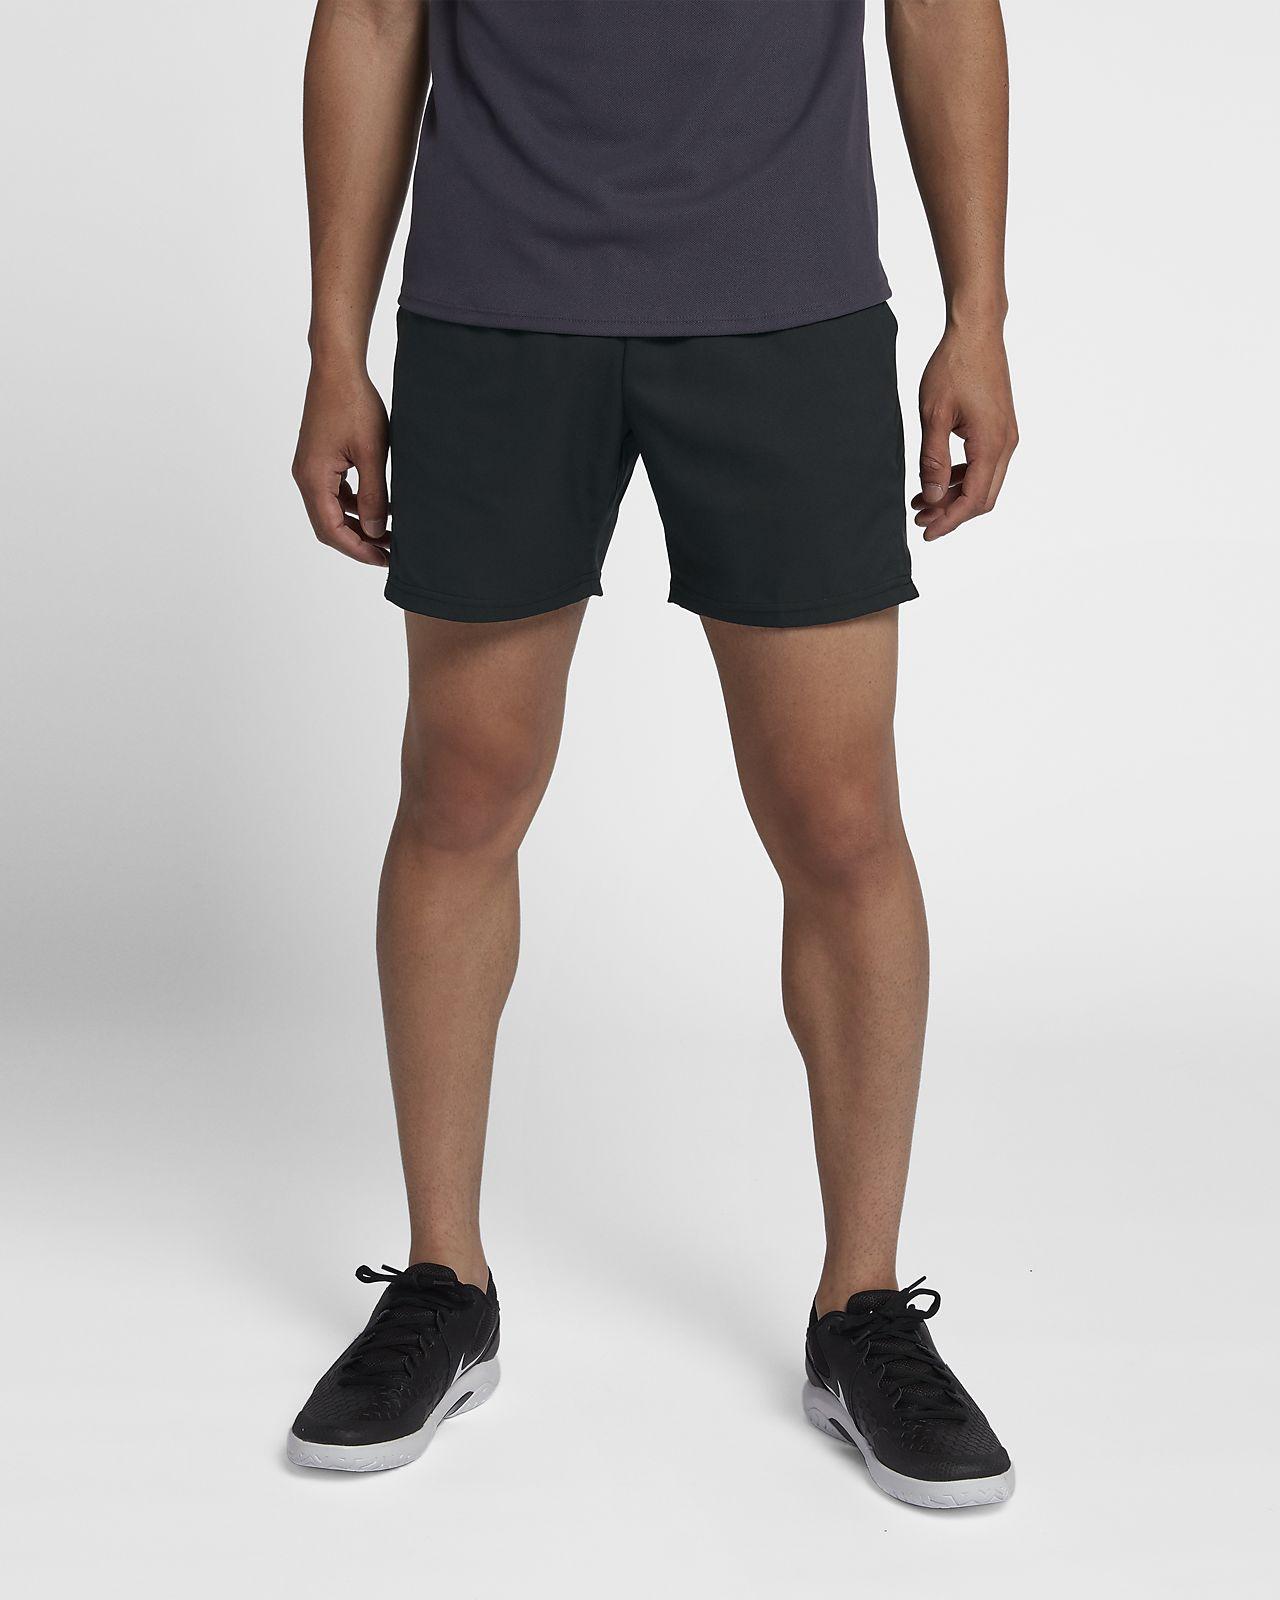 Shorts da tennis NikeCourt Dri-FIT - Uomo